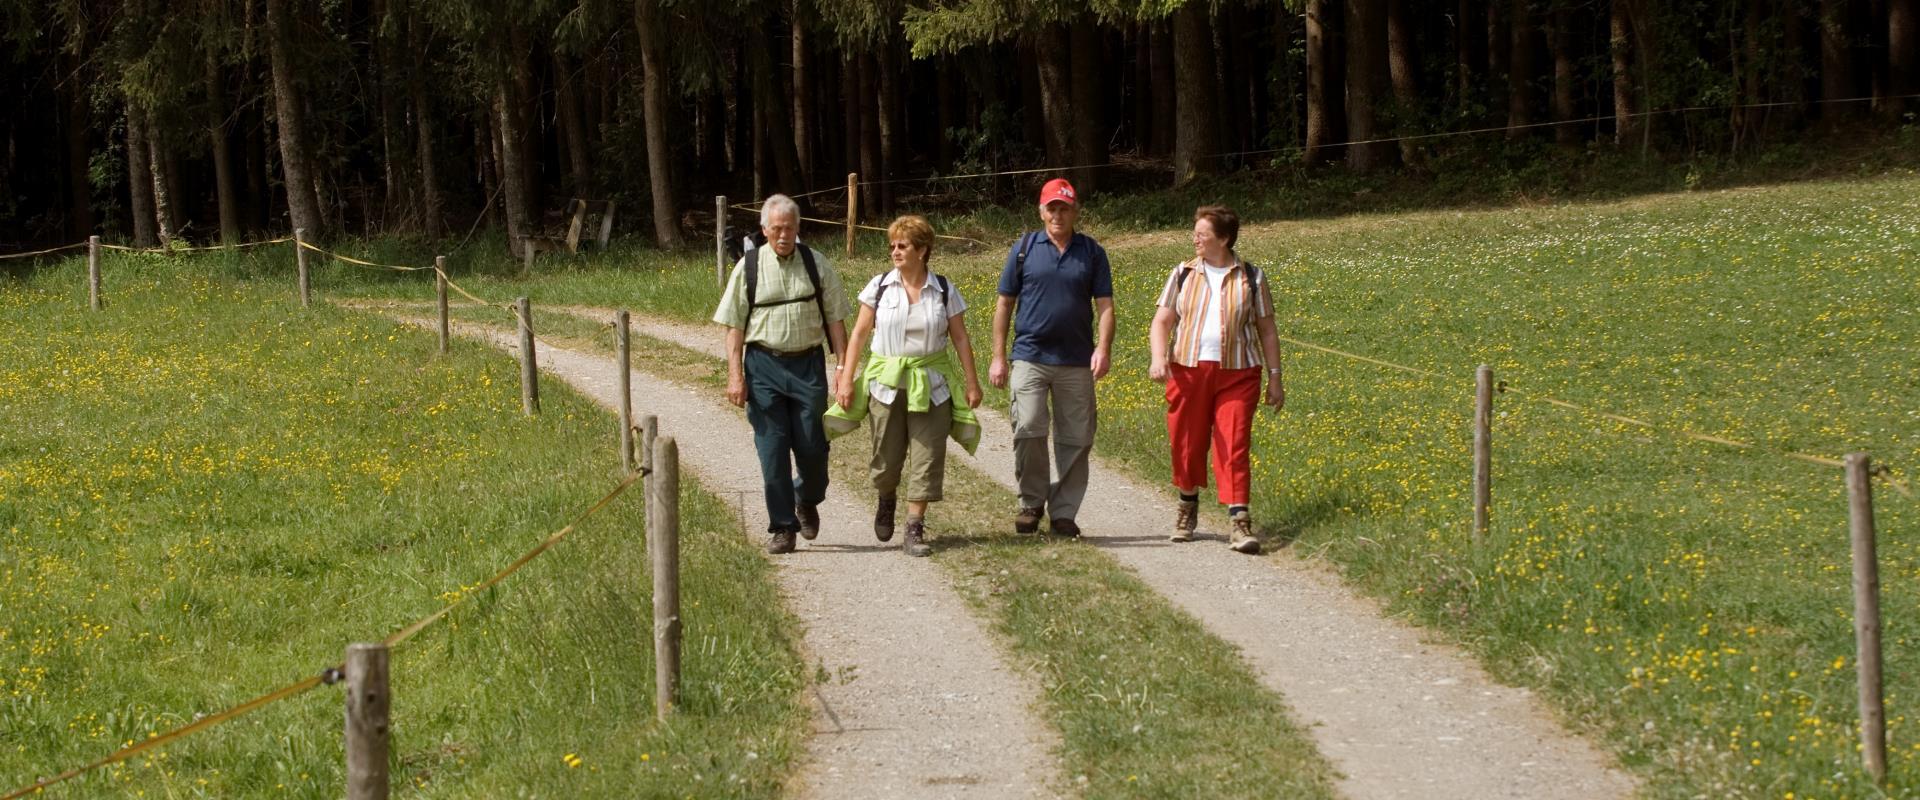 Wanderherbst in Seeon-Seebruck, © Tourist-Information Seebruck